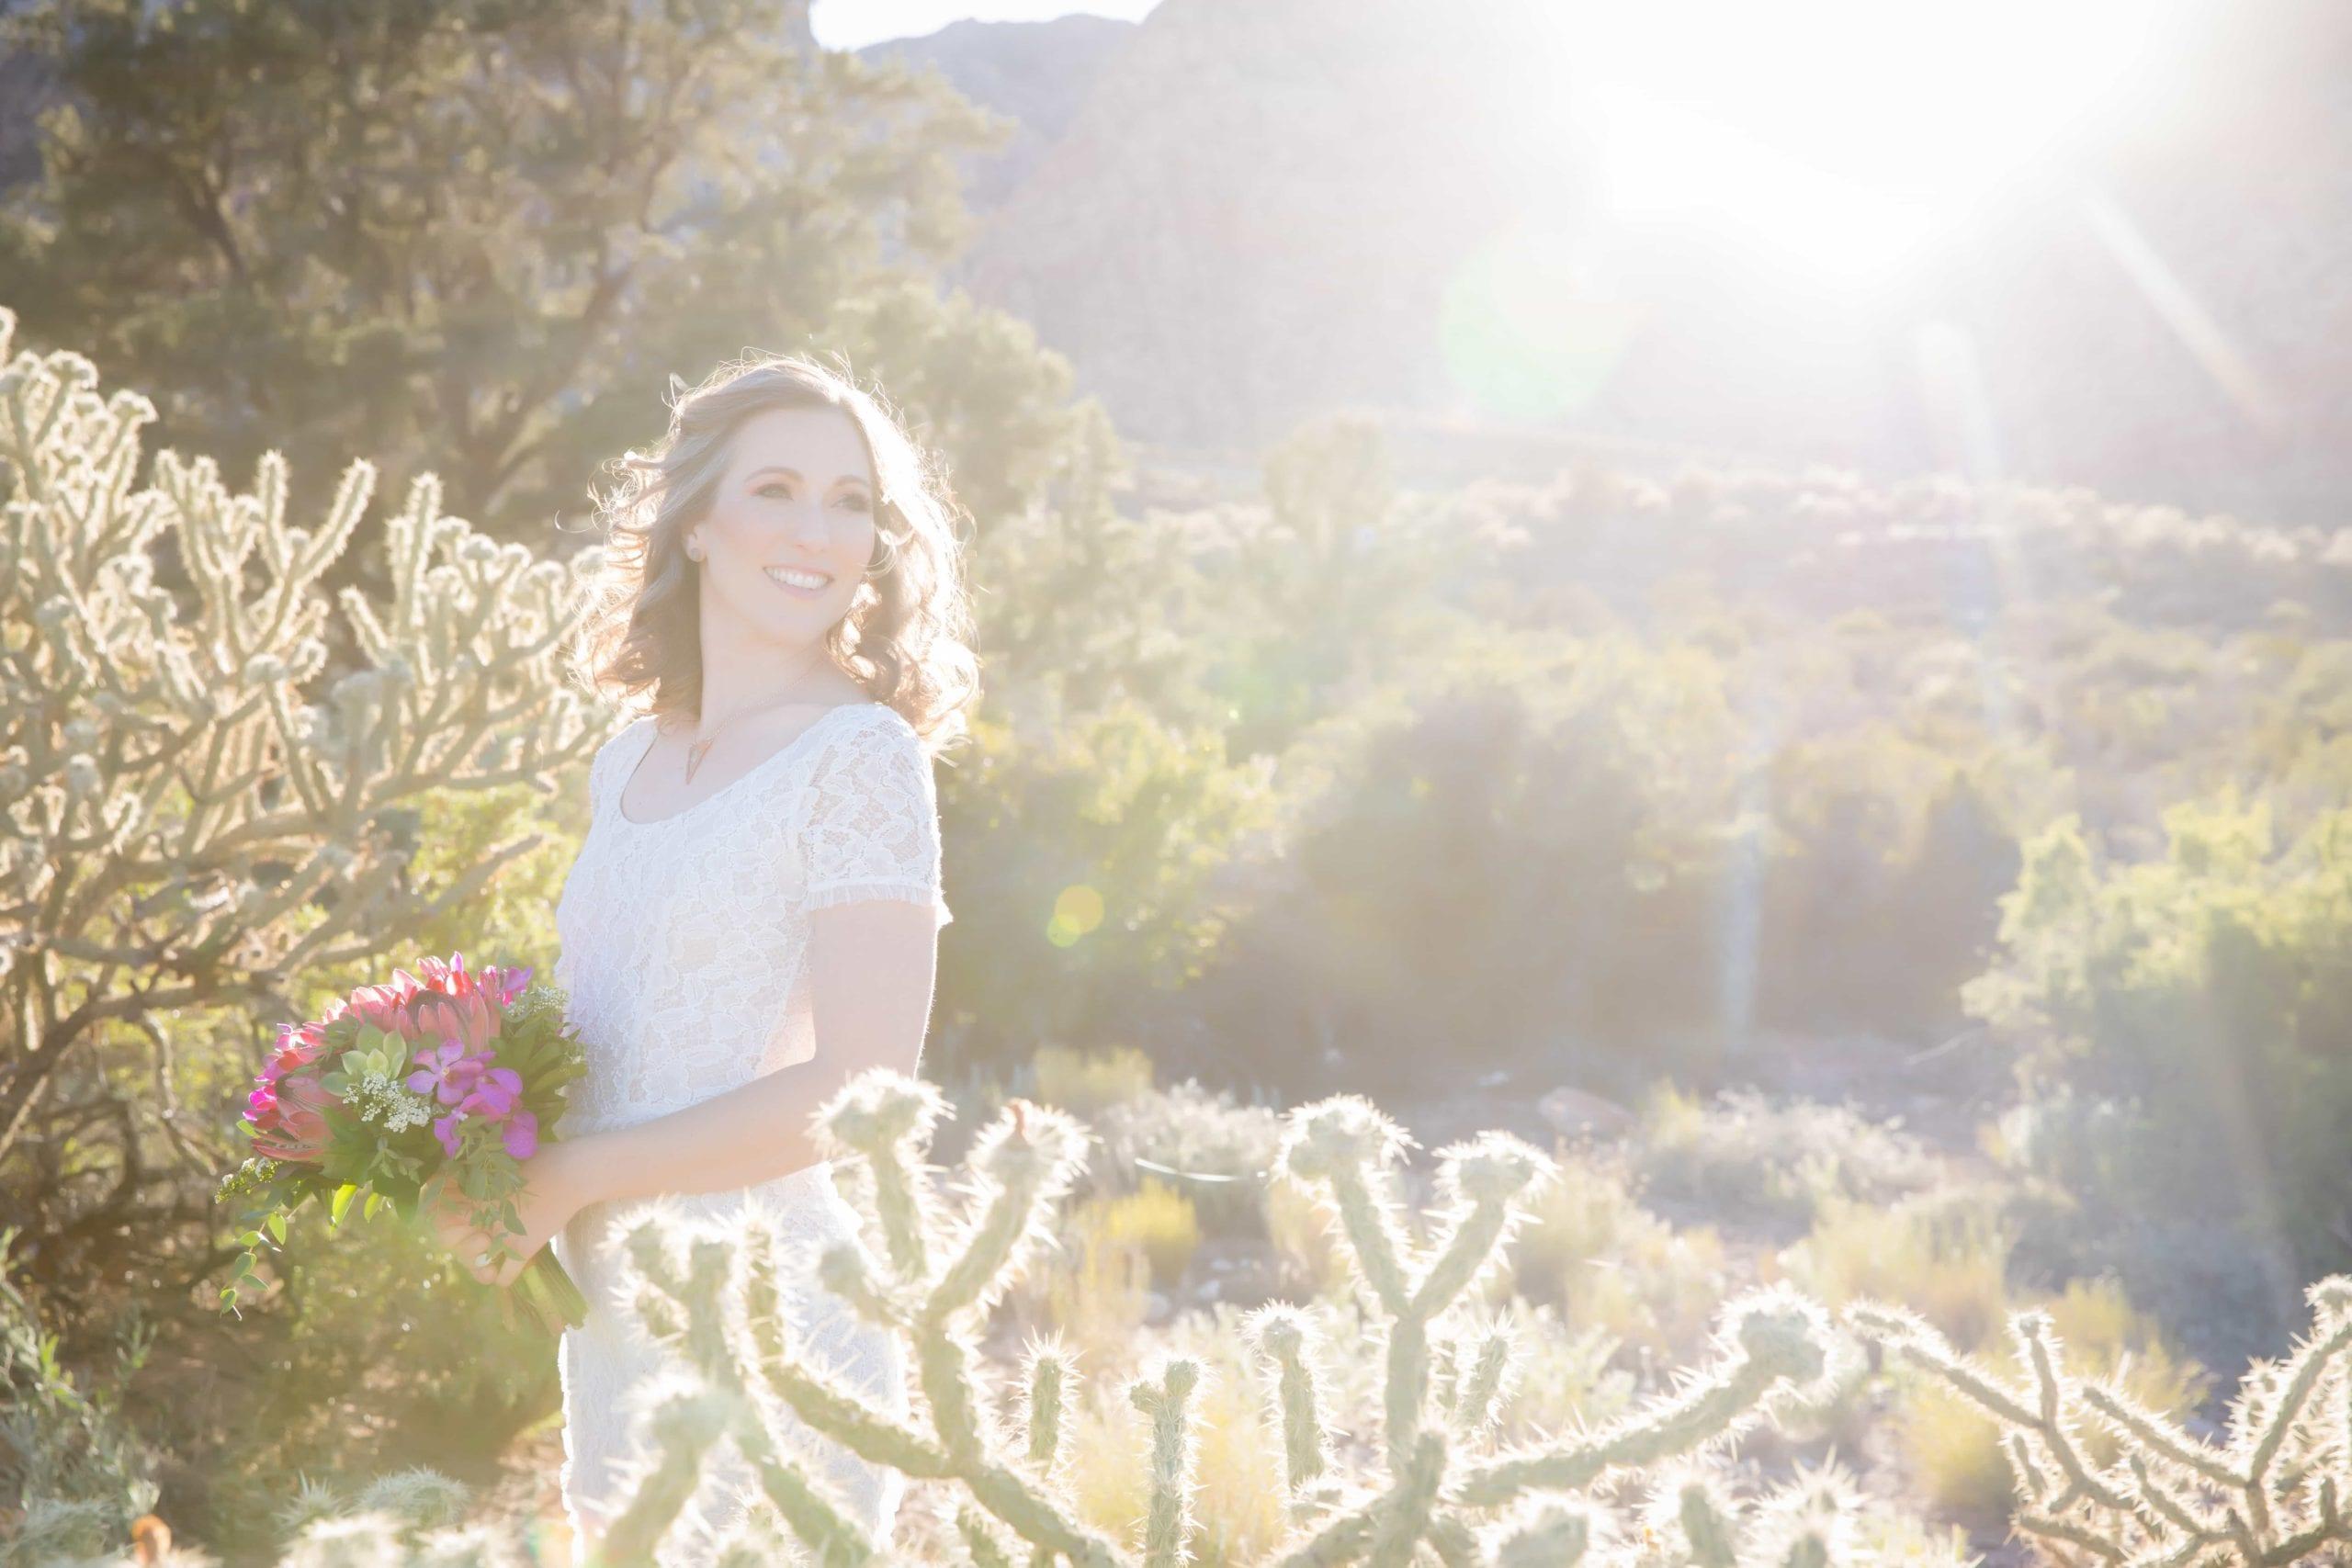 Bonnie Springs, Best Wedding Venue in Las Vegas by Cactus Collective Weddings